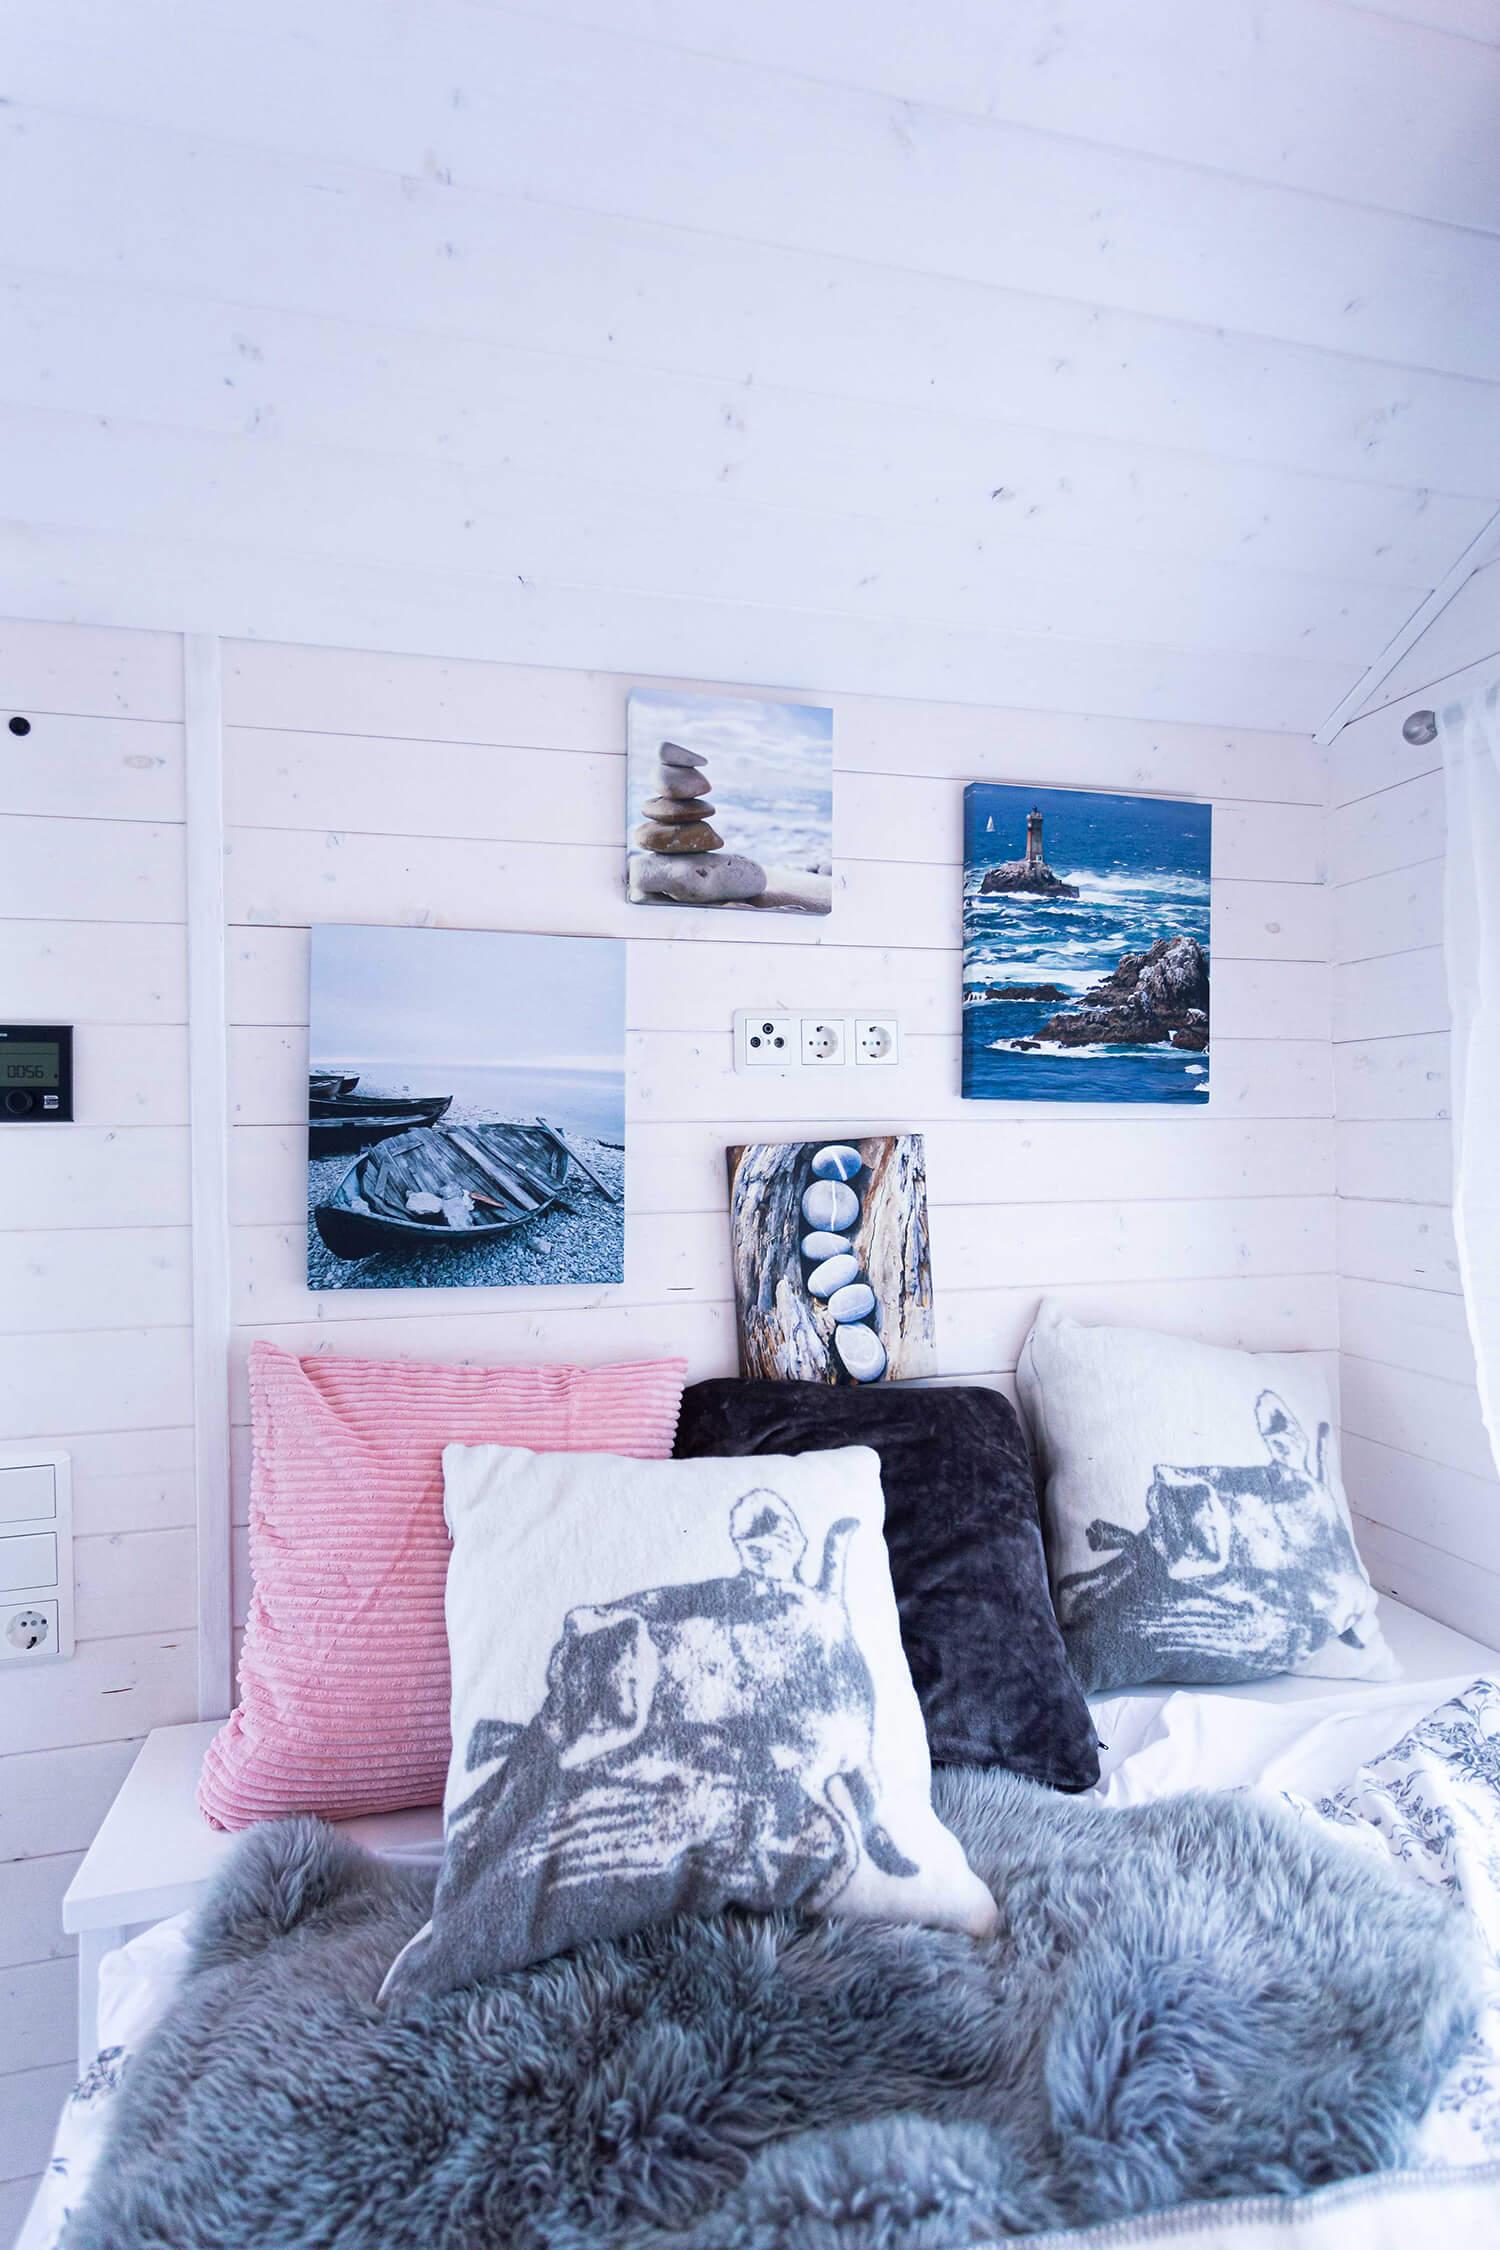 mobiles-tiny-house-kueste-vital-camp-gmbh33